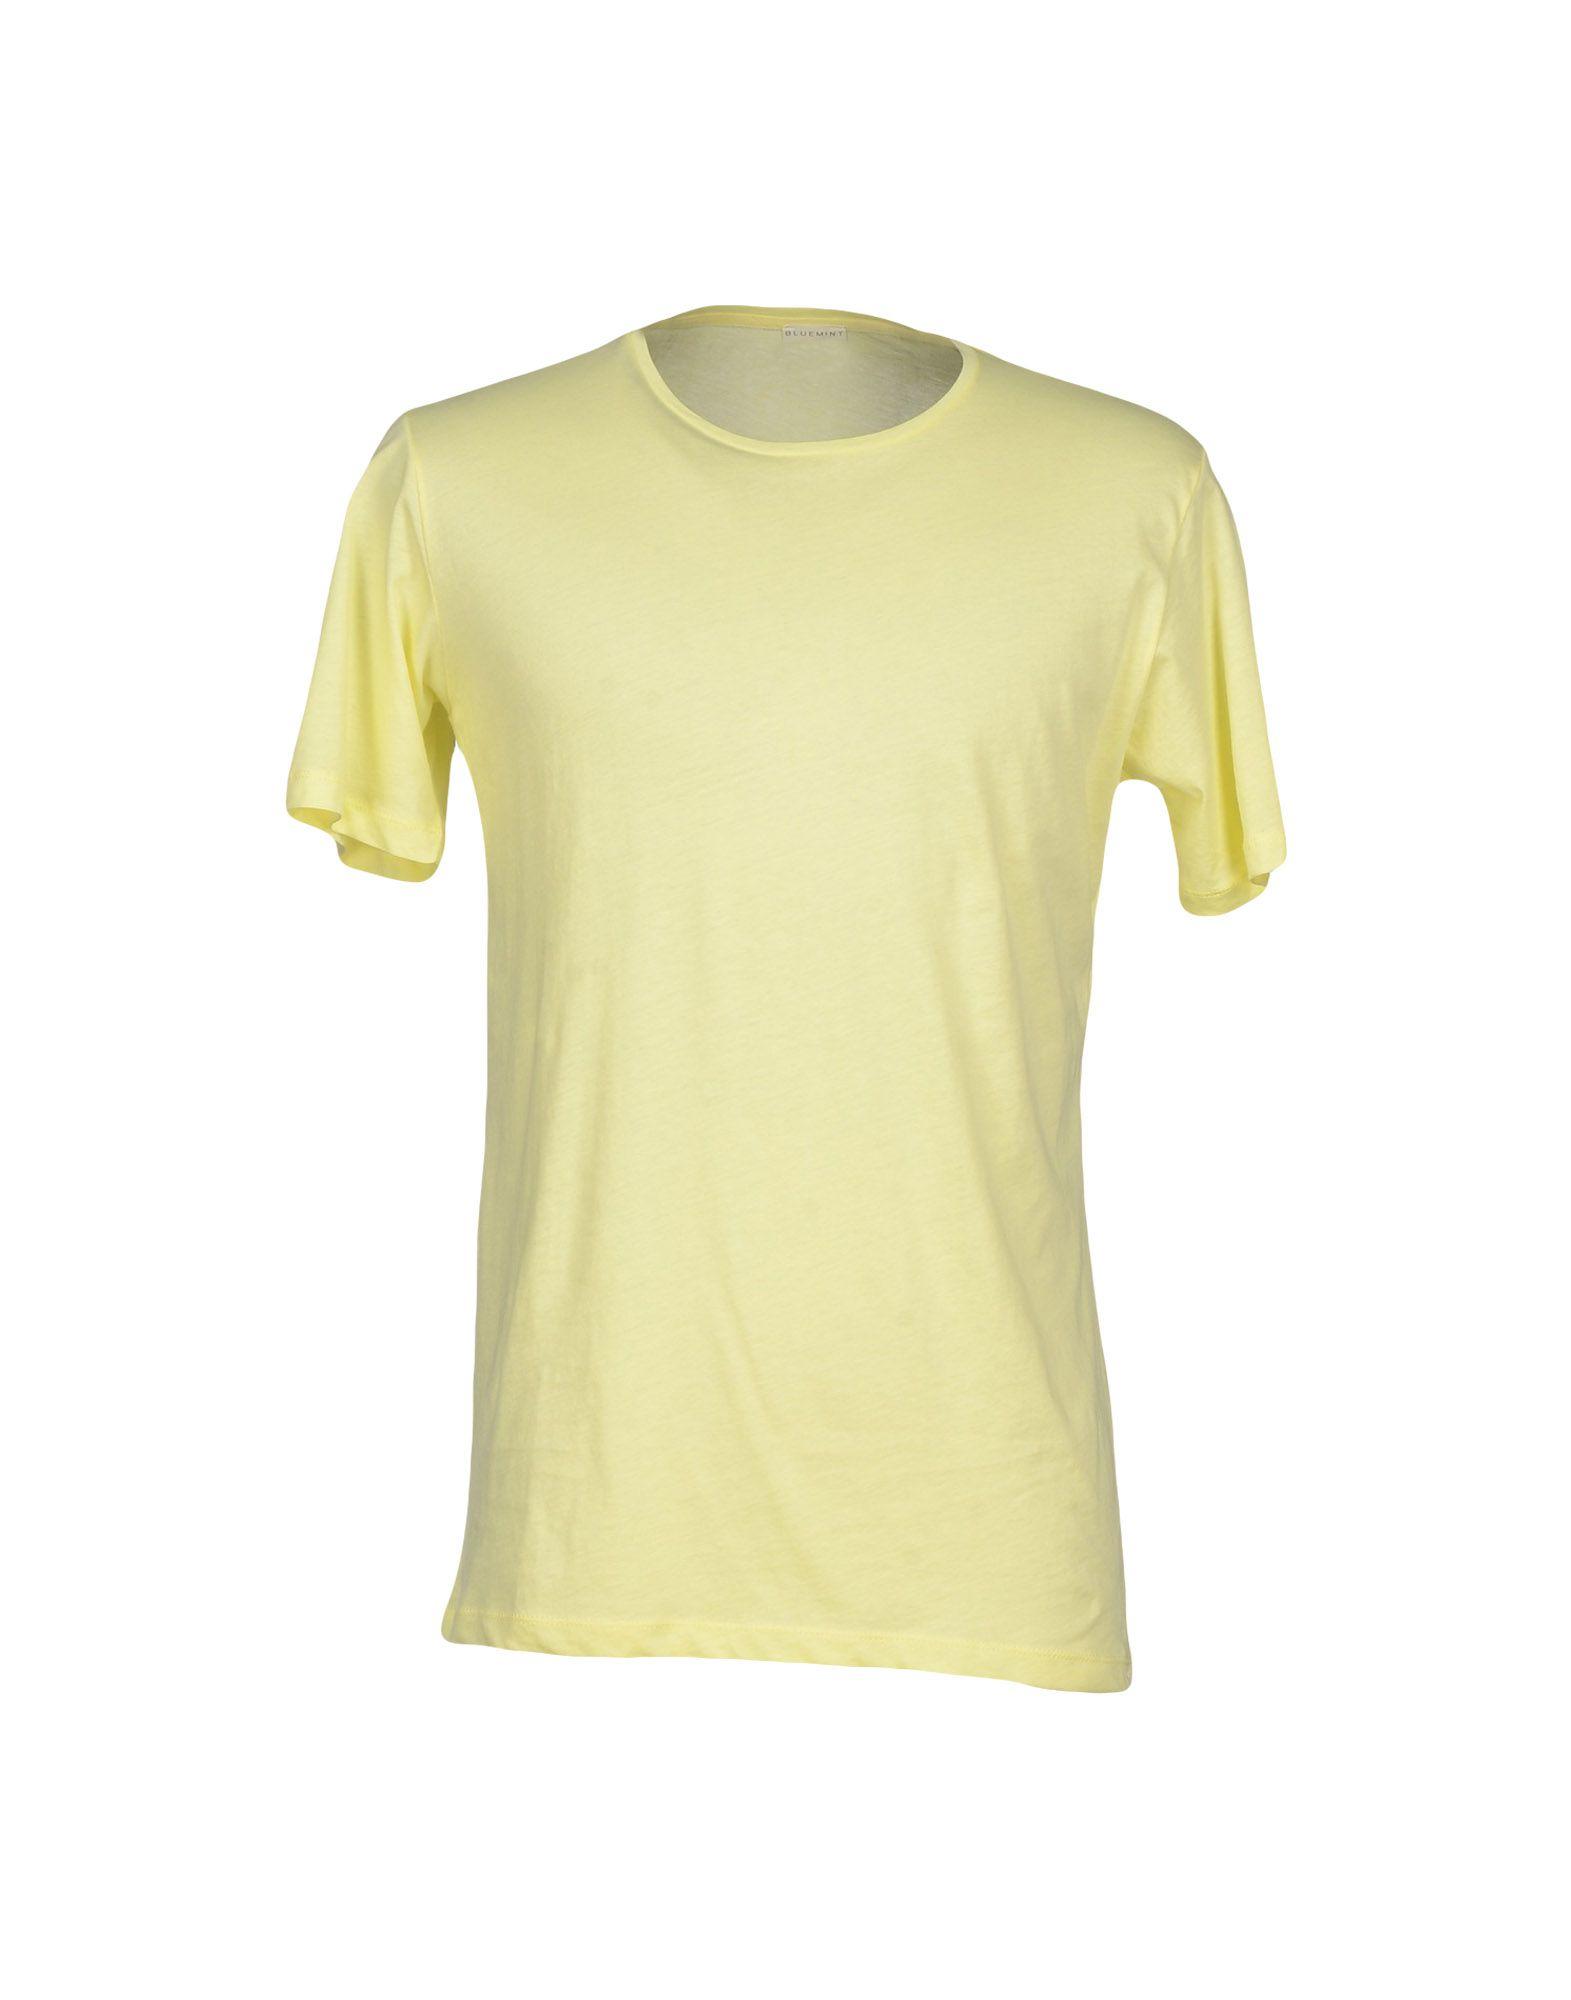 BLUEMINT T-Shirt in Light Yellow